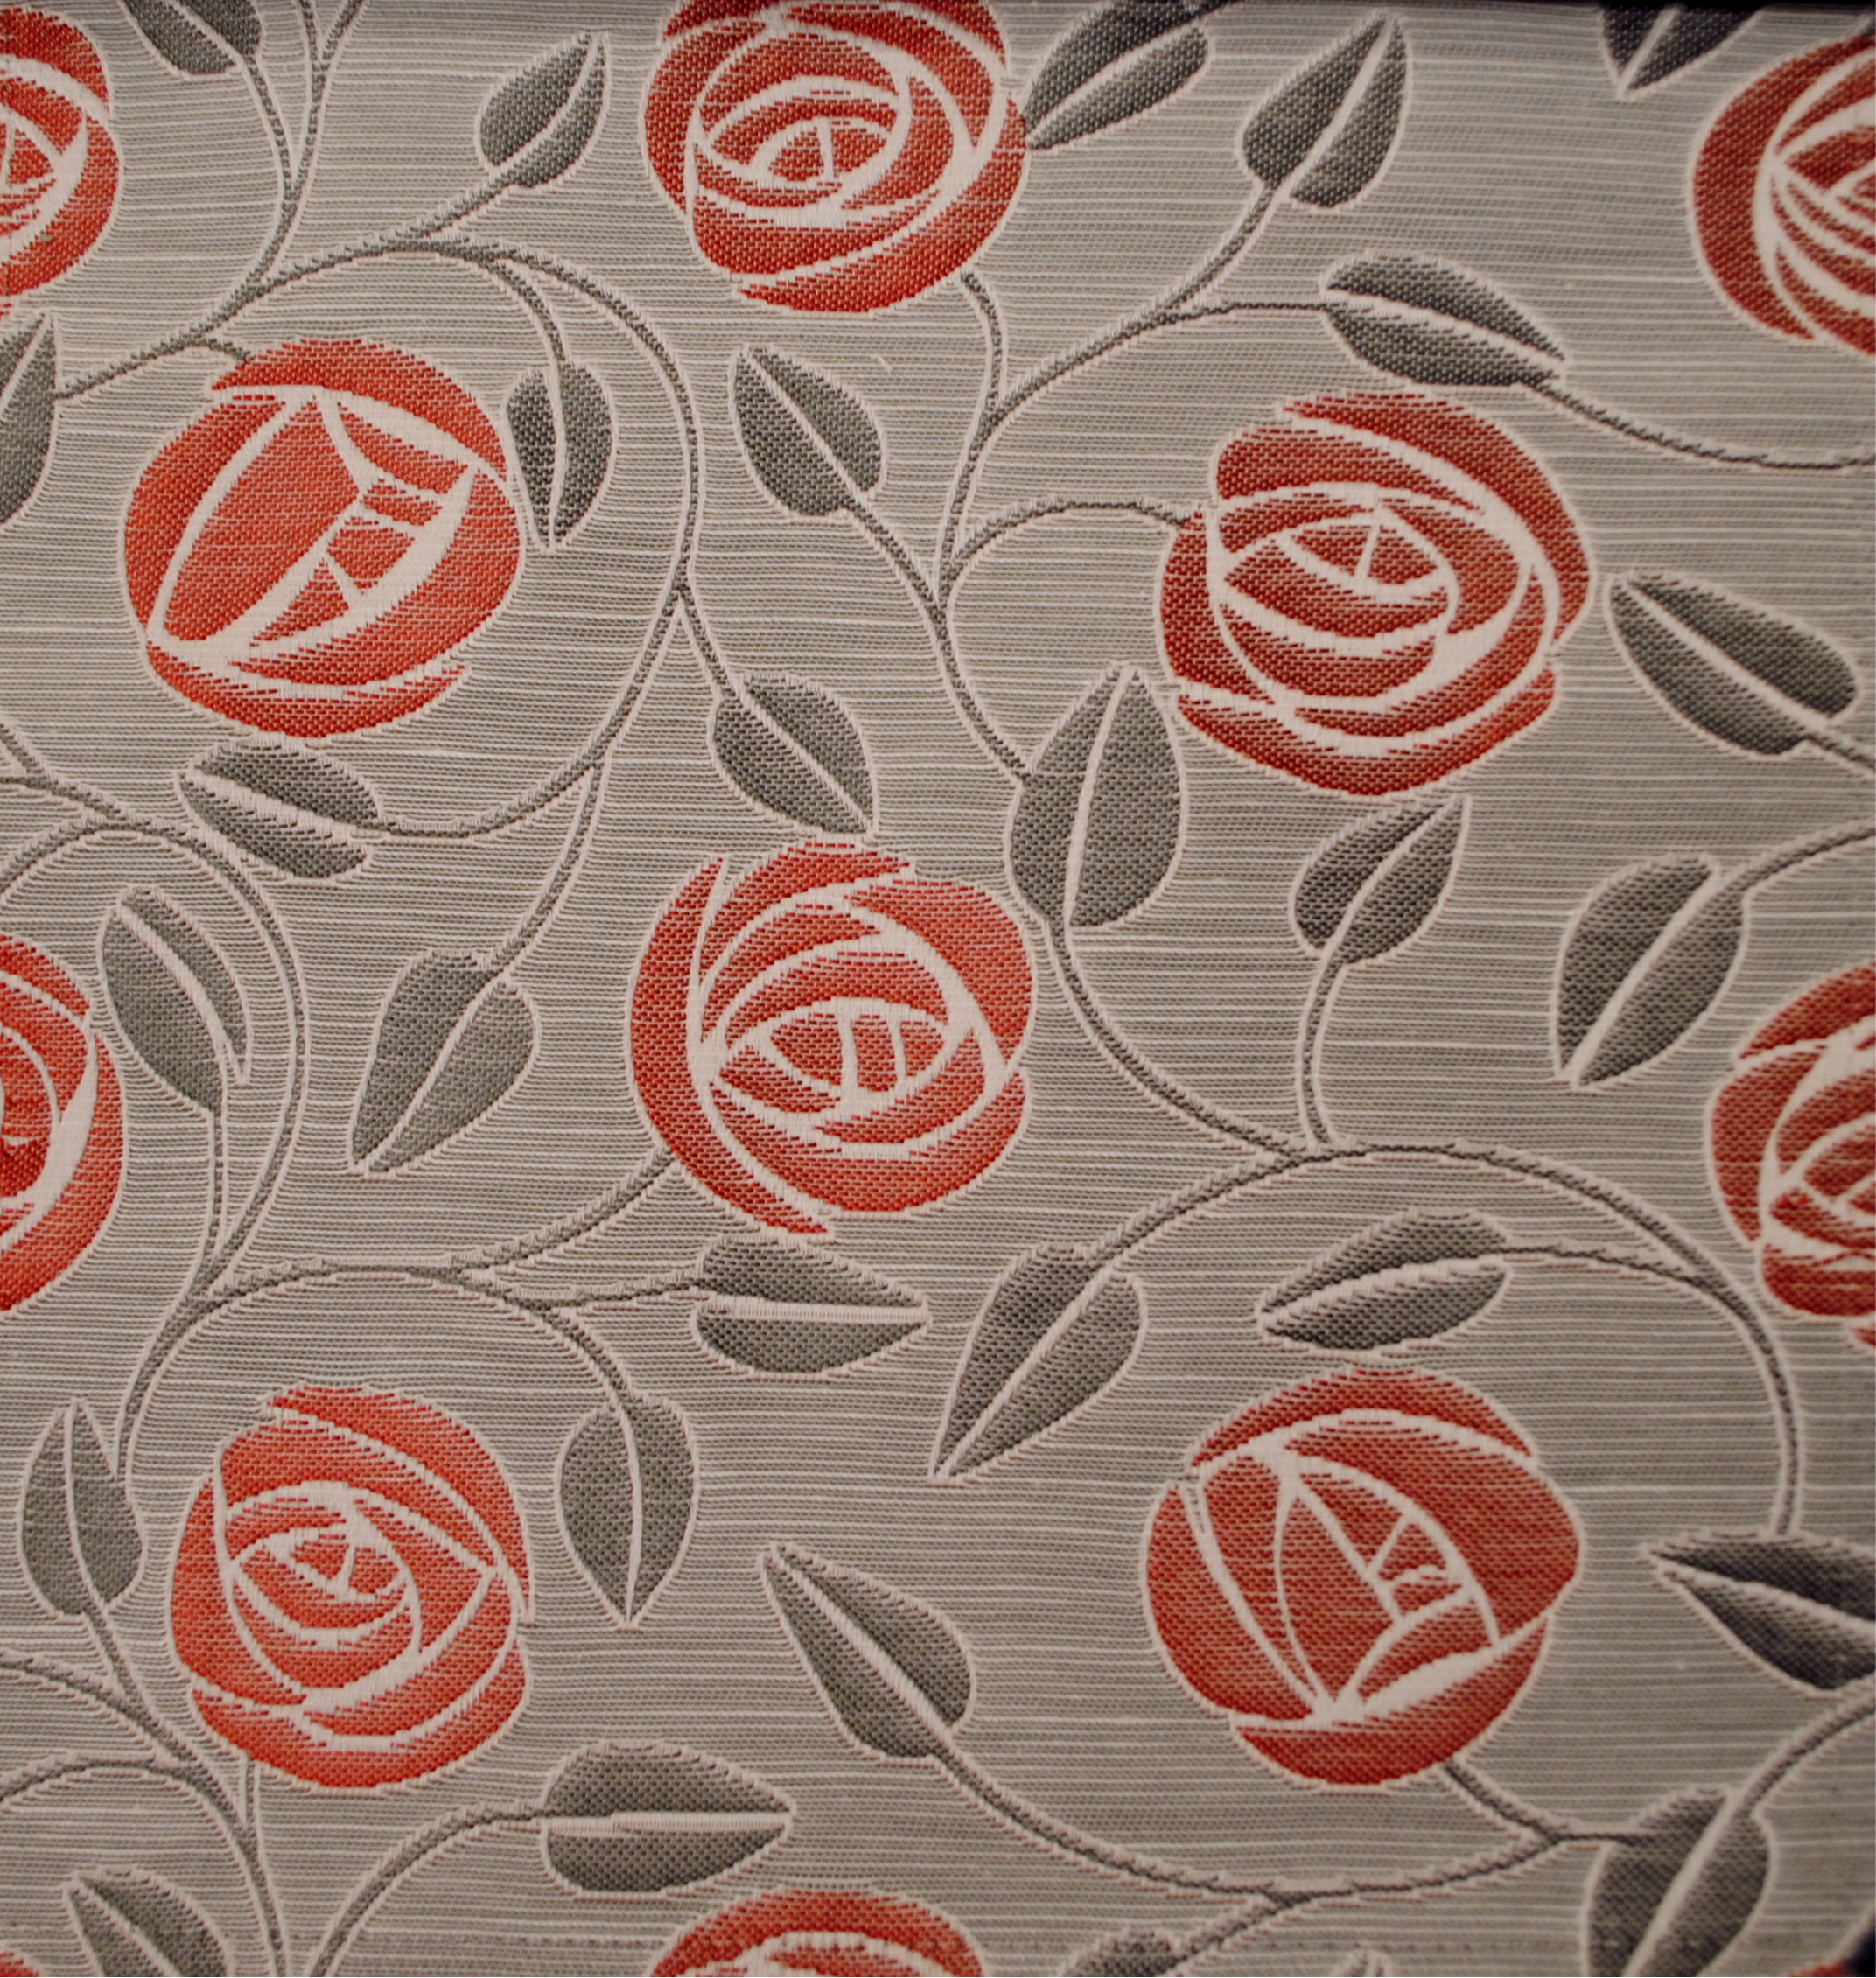 Rennie Mackintosh Curtain Fabric Functionalities Net